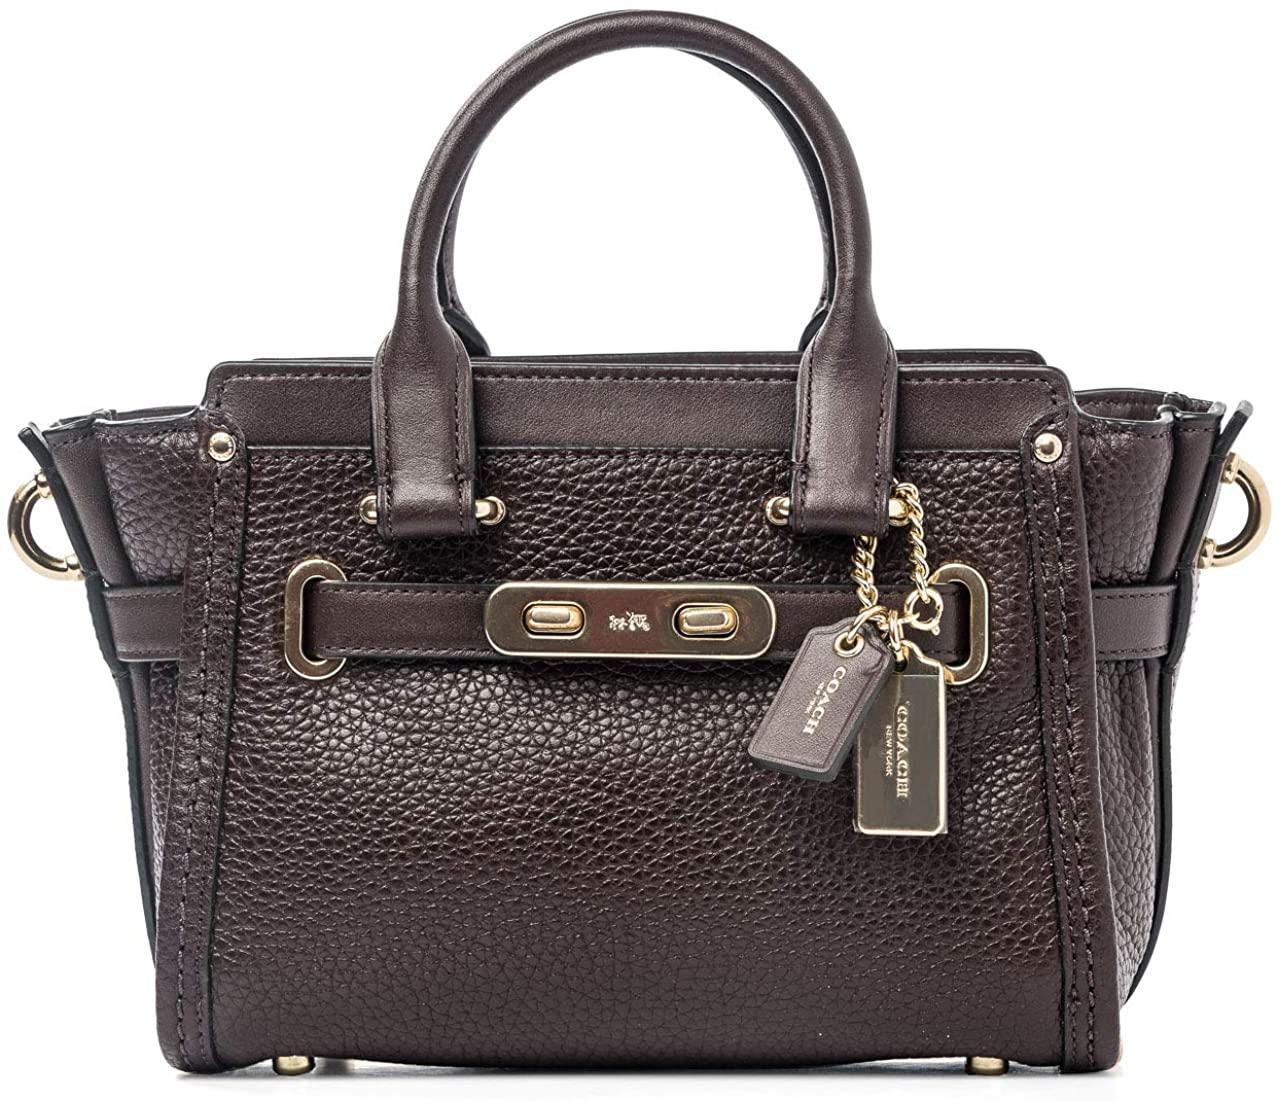 COACH Womens Swagger 20 Oxblood Burgundy Leather Handbag Bag New